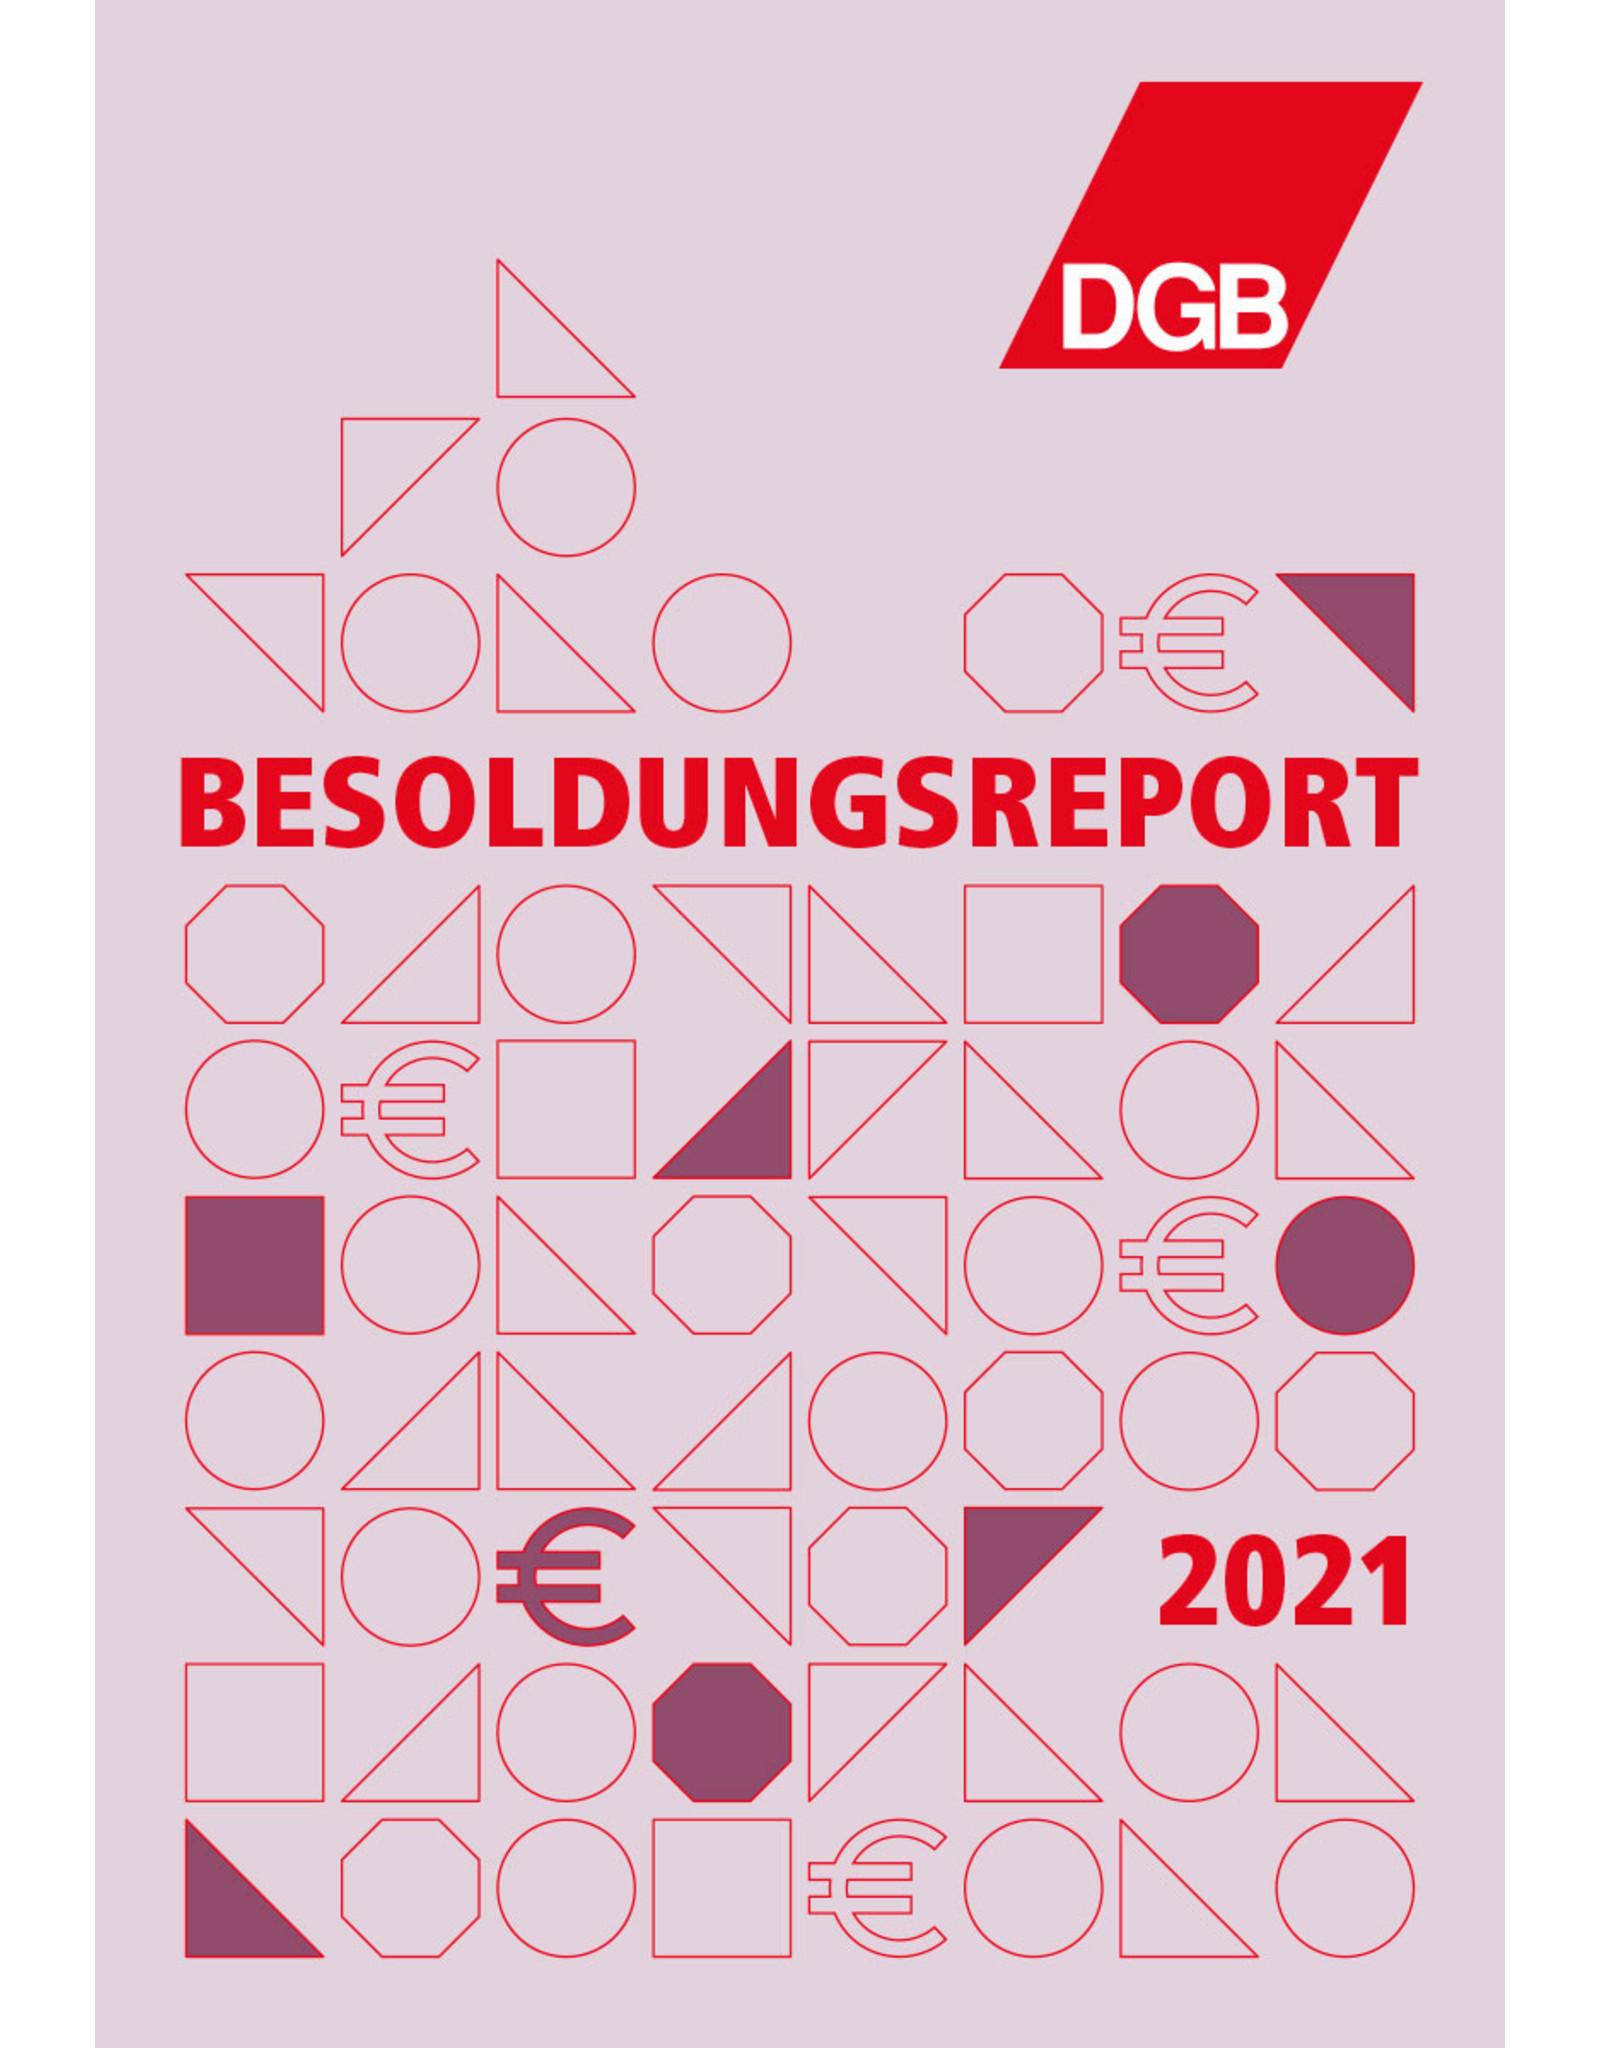 DGB Besoldungsreport 2021